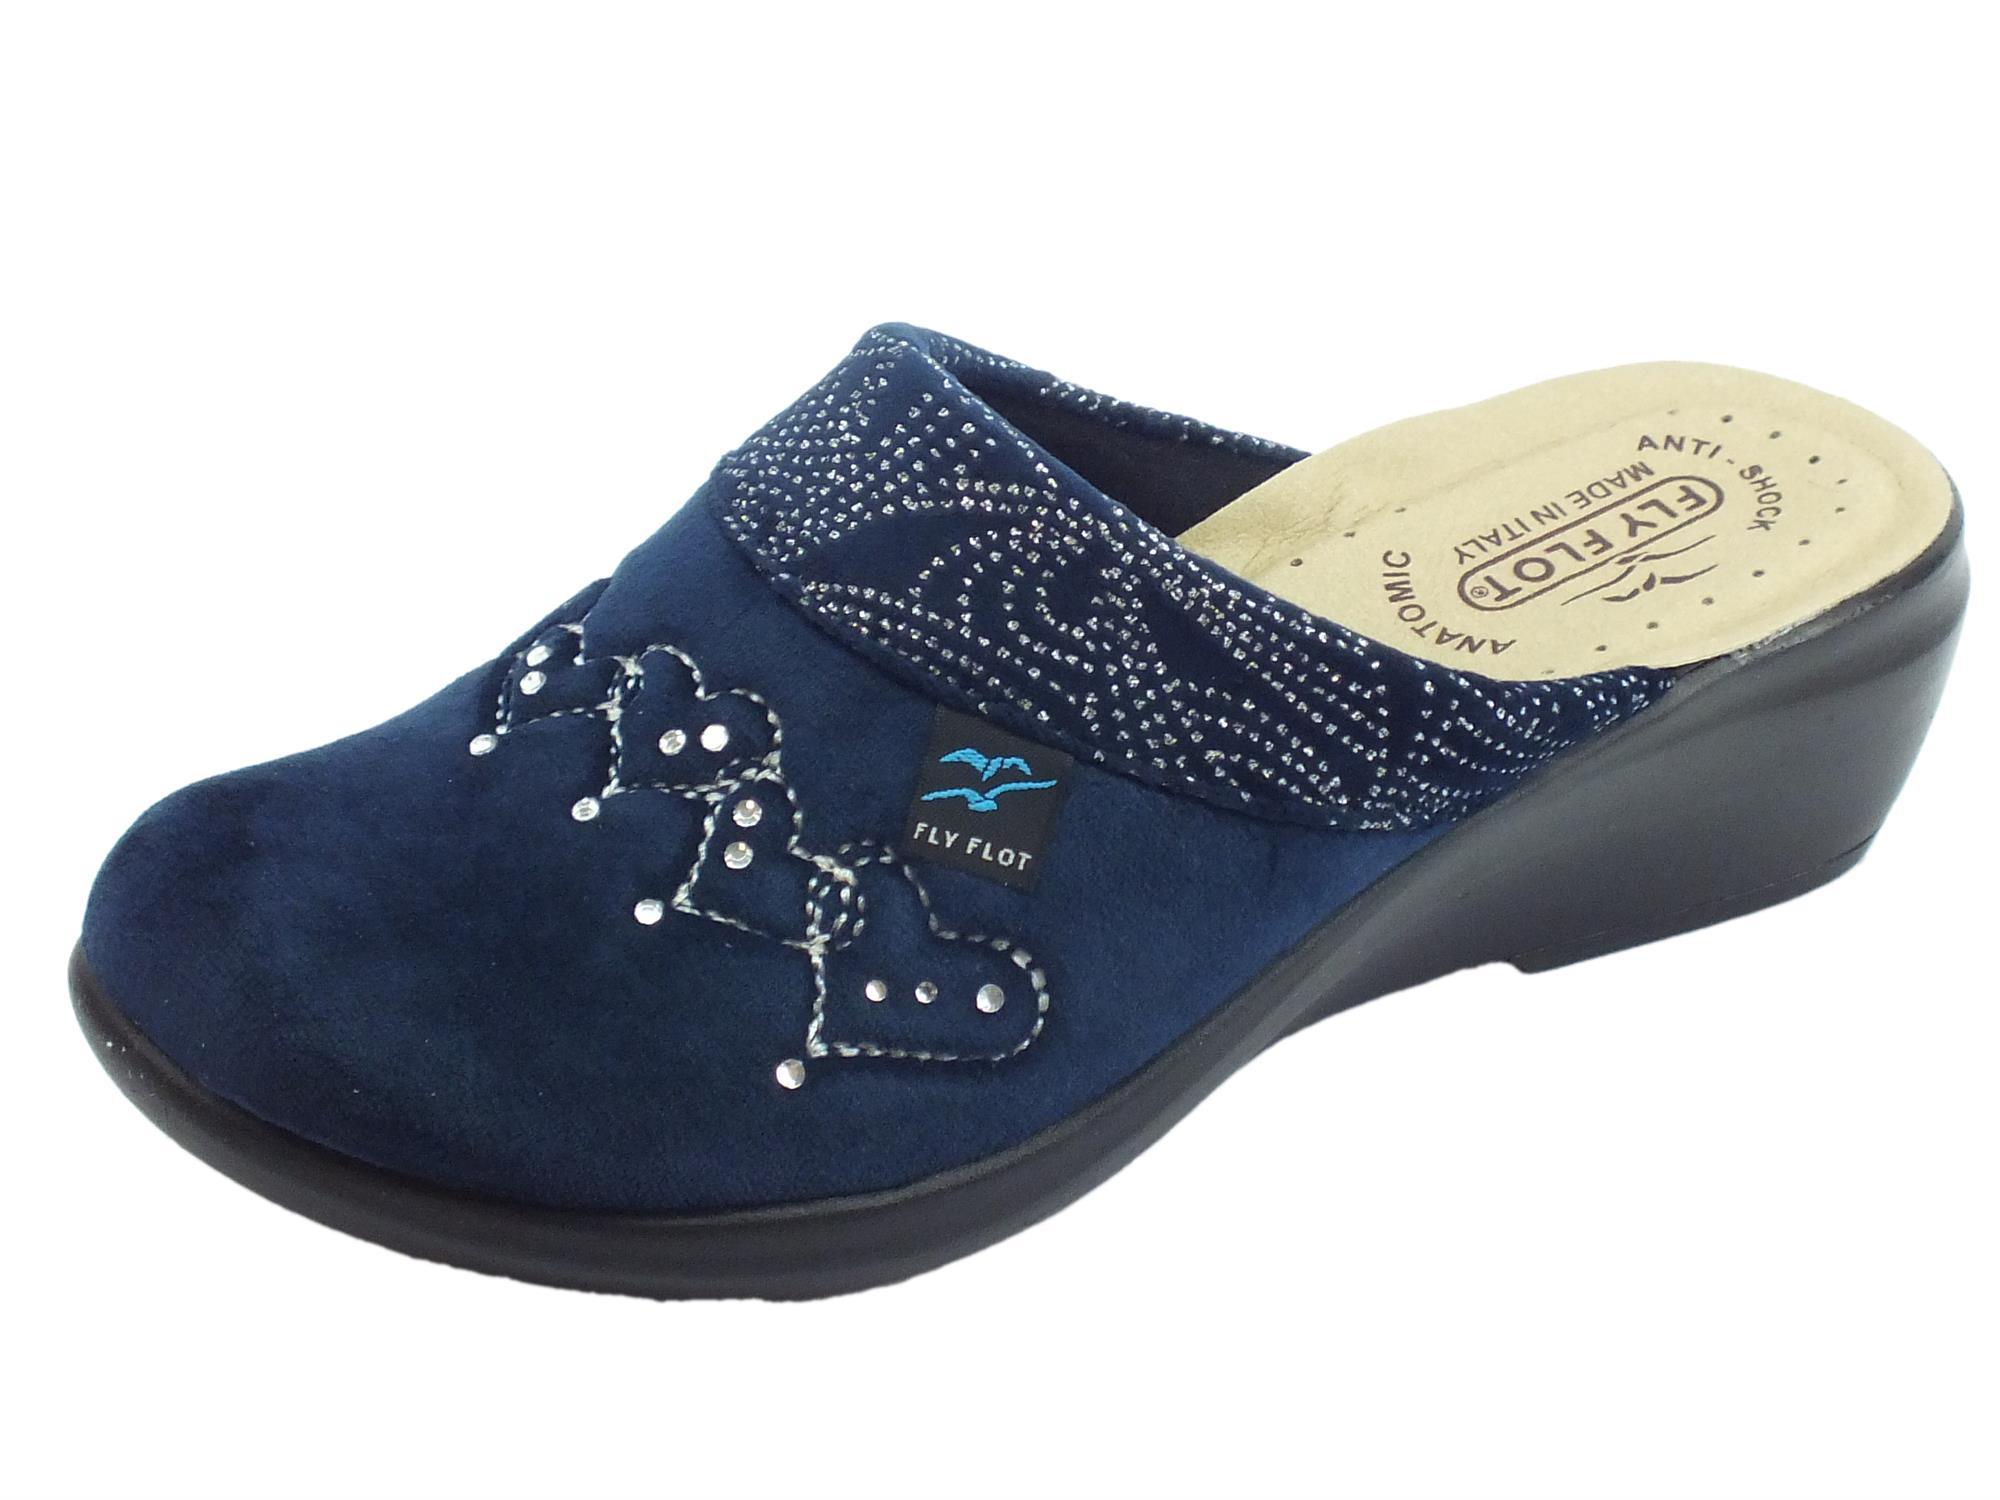 Pantofole FlyFlot per donna in tessuto pile blu sottopiede anti-shock zeppa  alta 30355d9f2d7